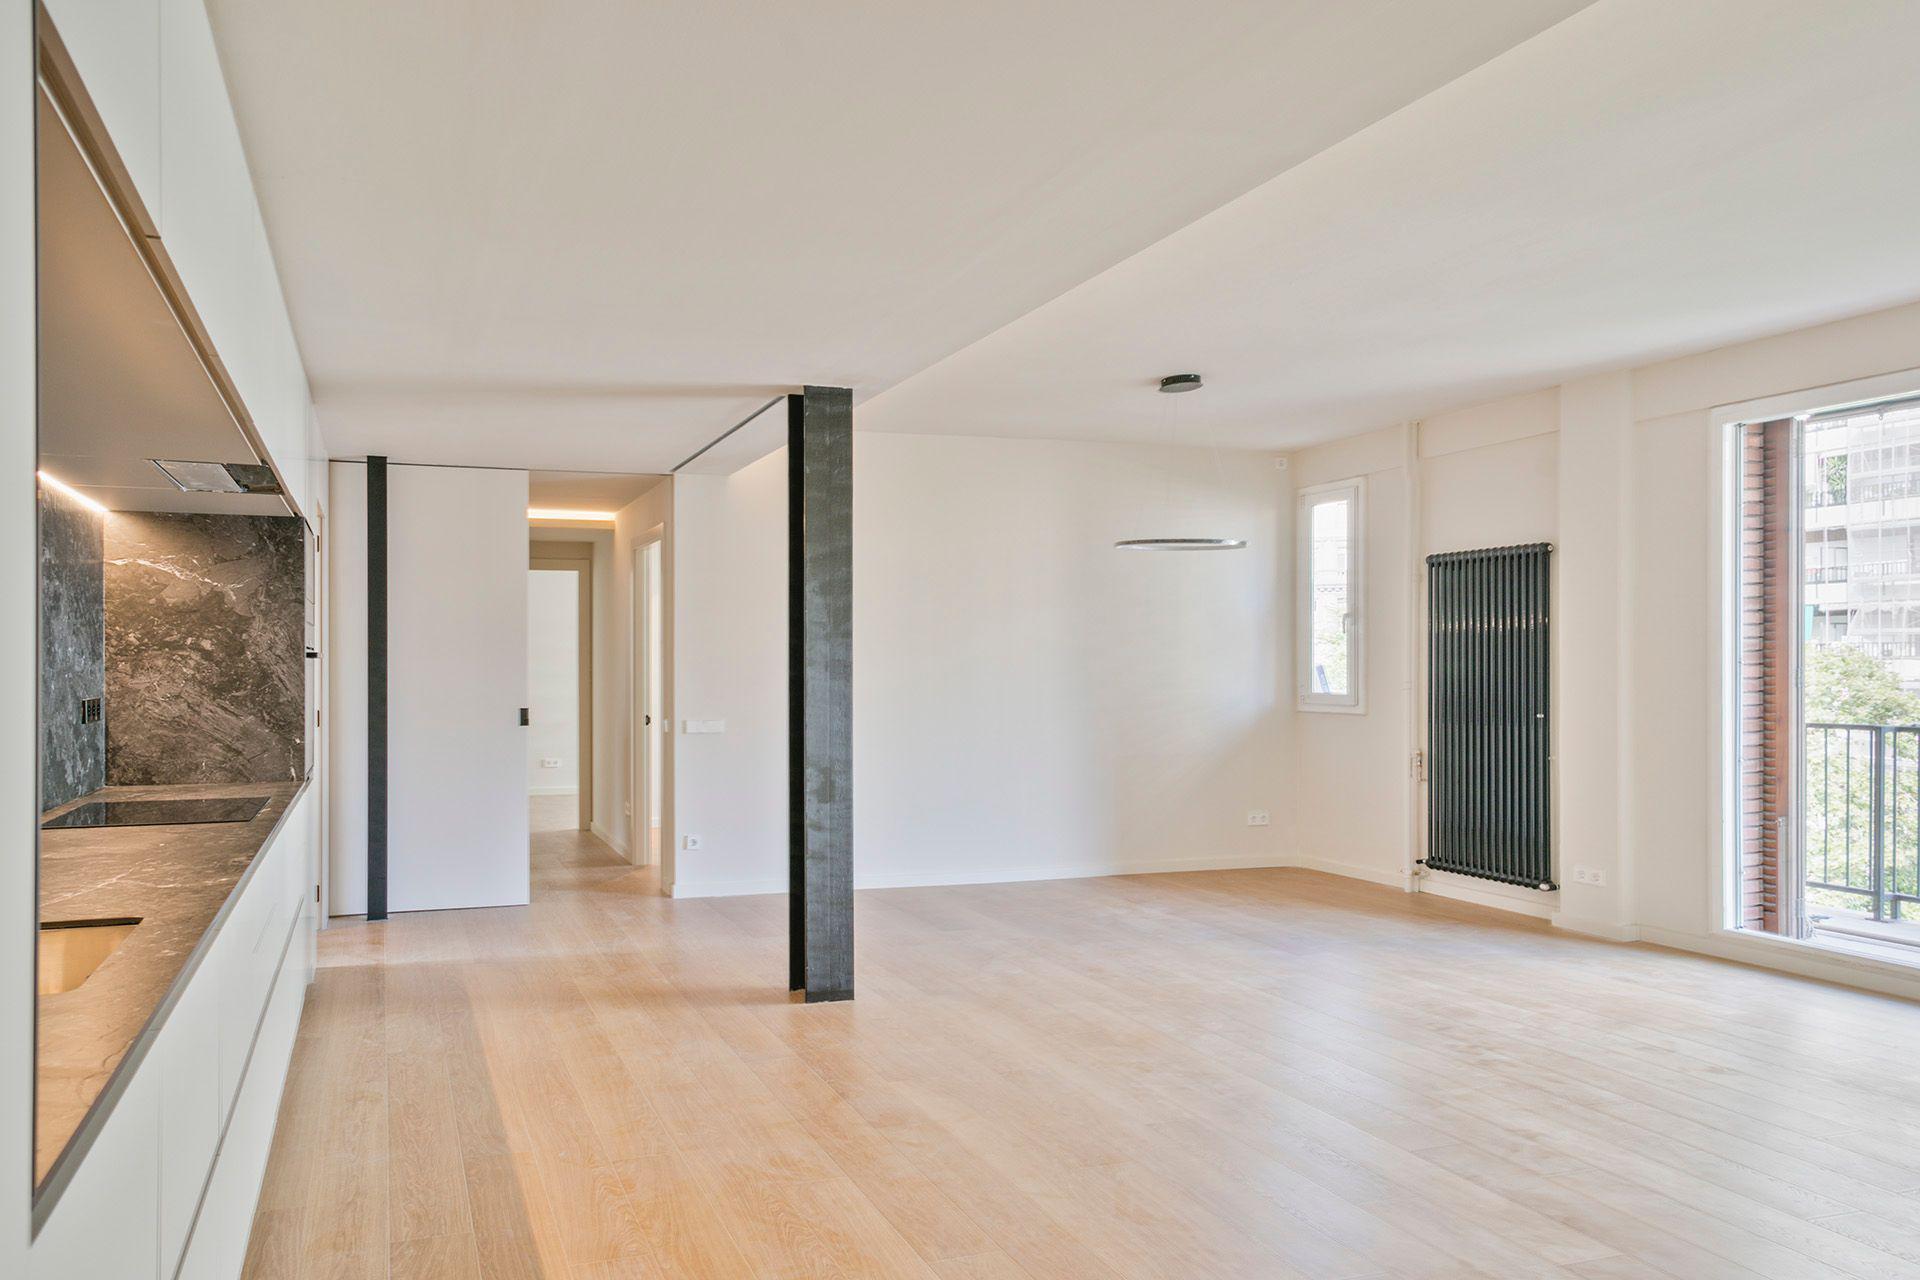 253492 Flat for sale in Sarrià-Sant Gervasi, Sant Gervasi-Galvany 11